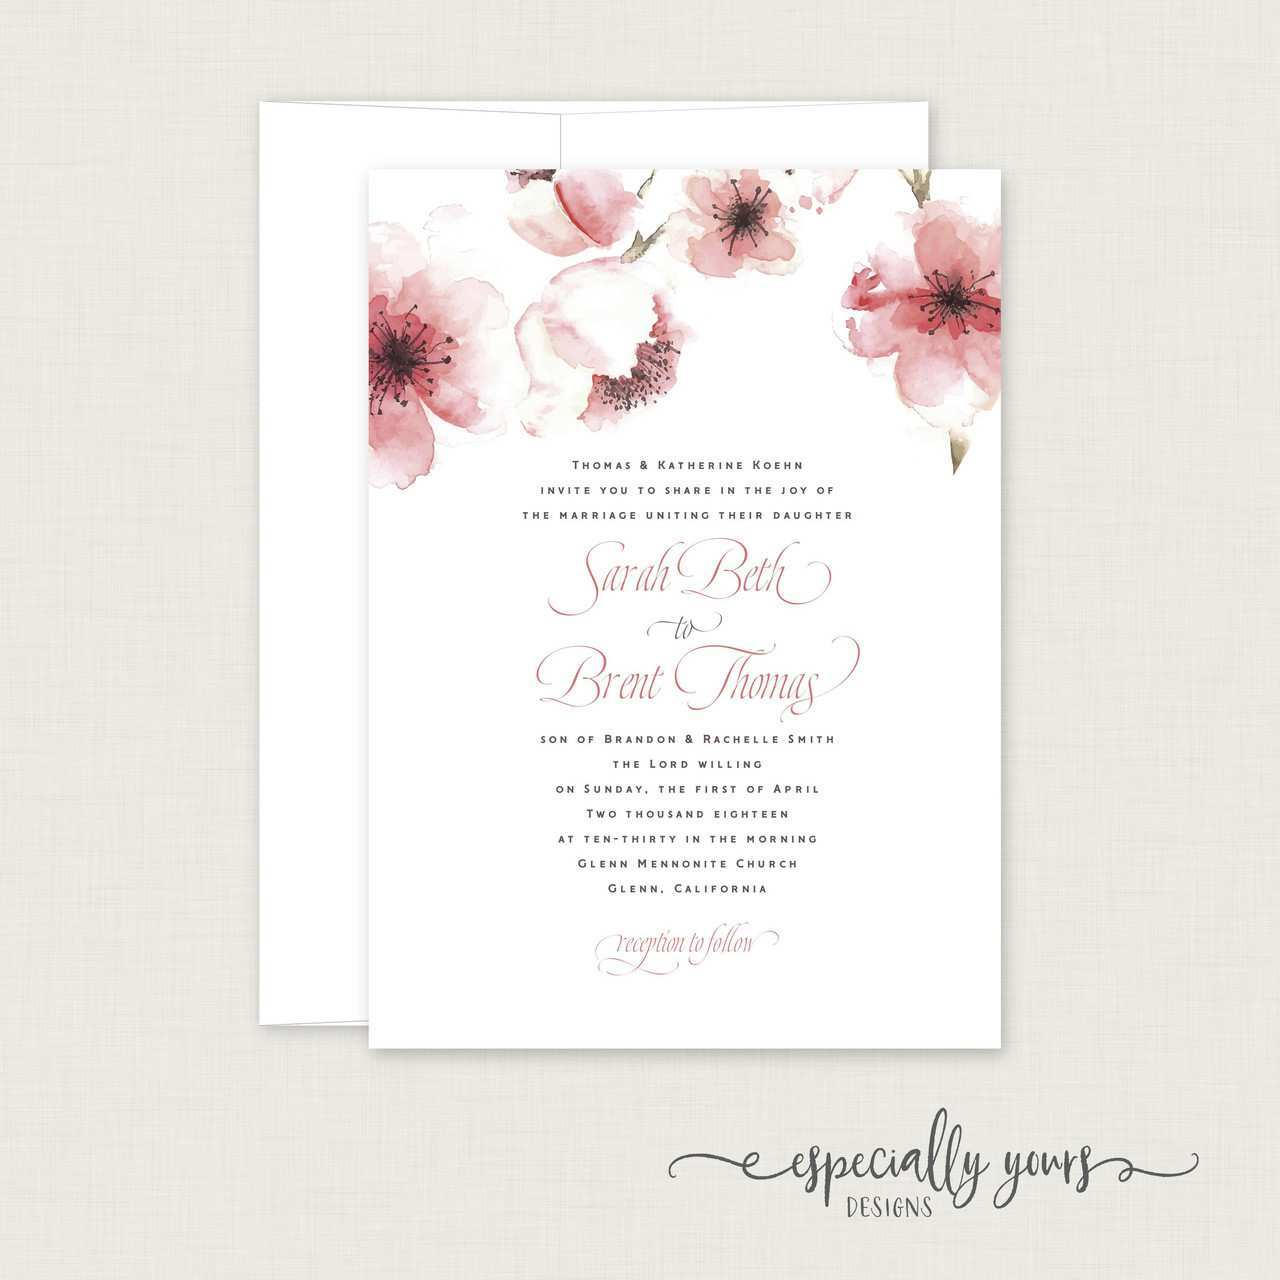 65 Blank Cherry Blossom Wedding Invitation Template For Free with Cherry  Blossom Wedding Invitation Template - Cards Design Templates